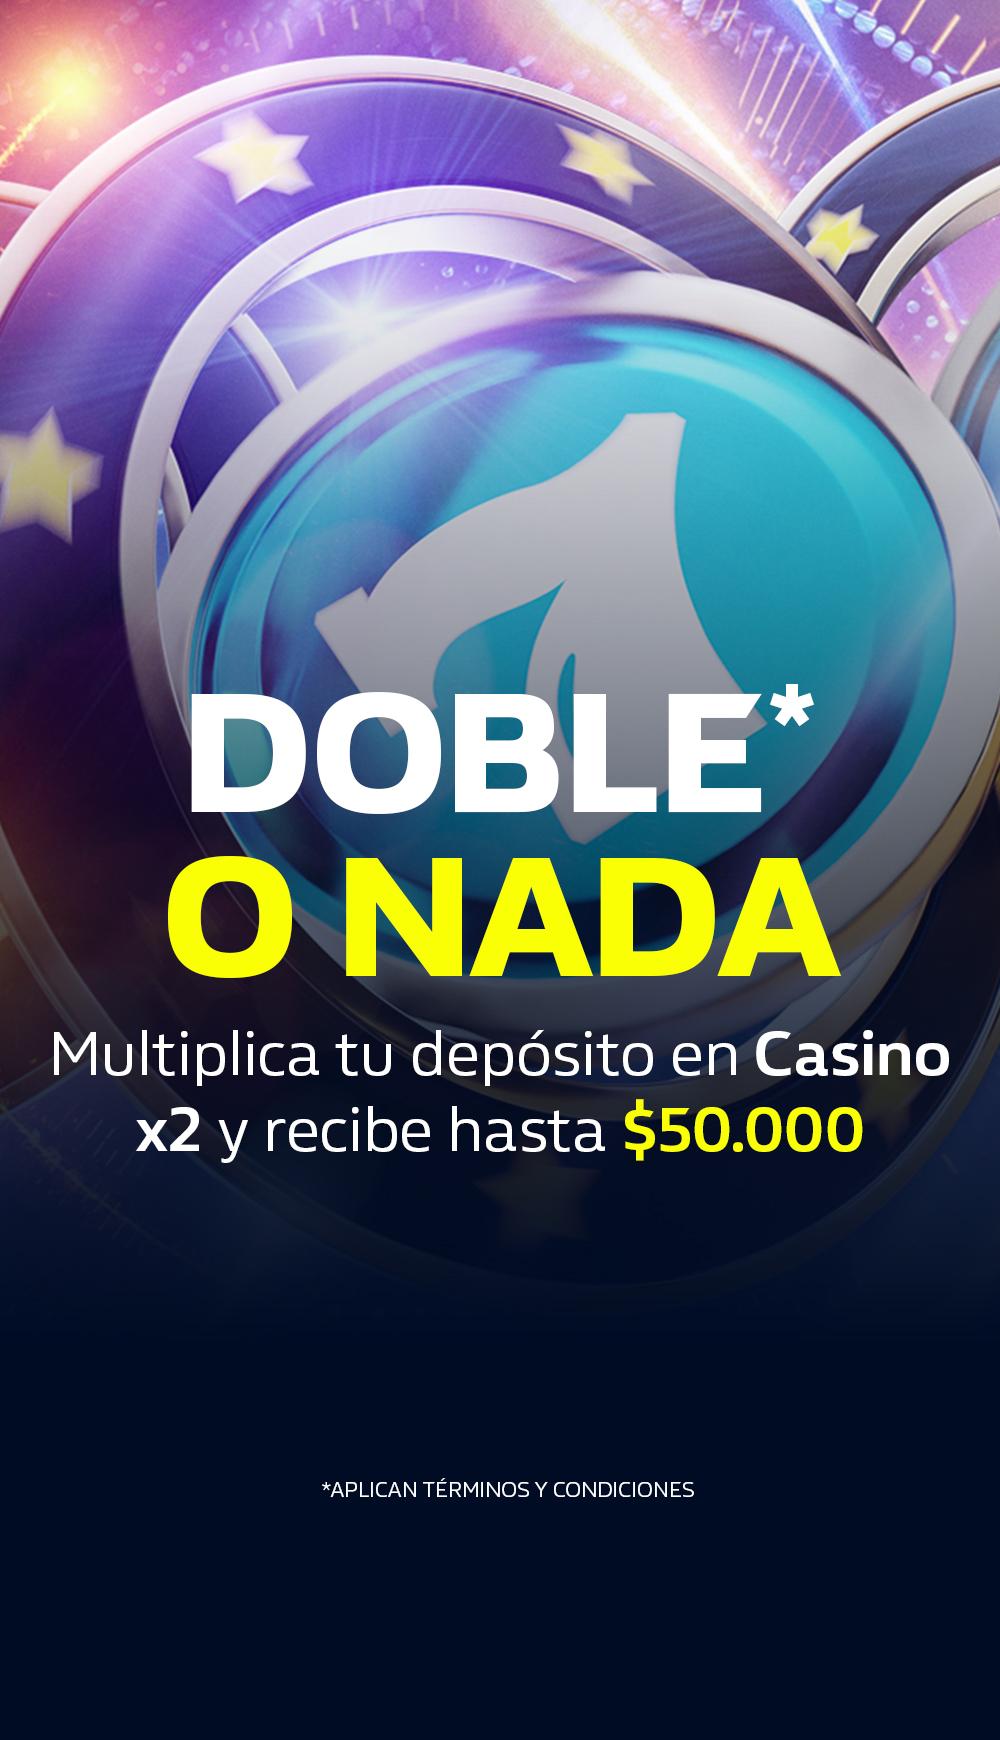 sportbook_doble-o-nada-casino_Mobile_full